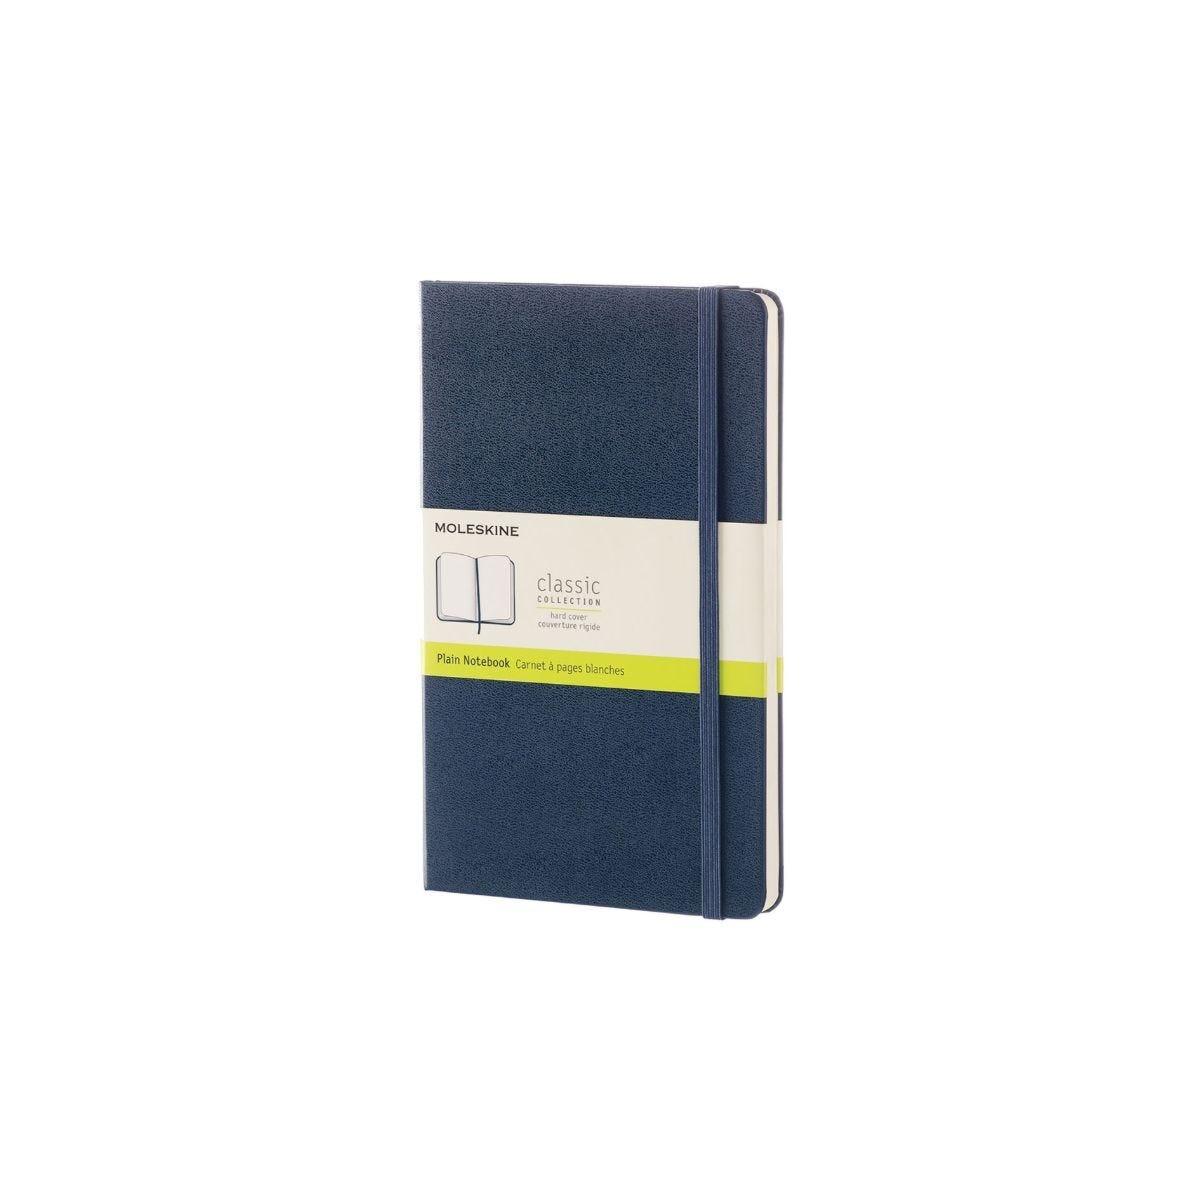 Moleskine Classic Notebook Large Plain